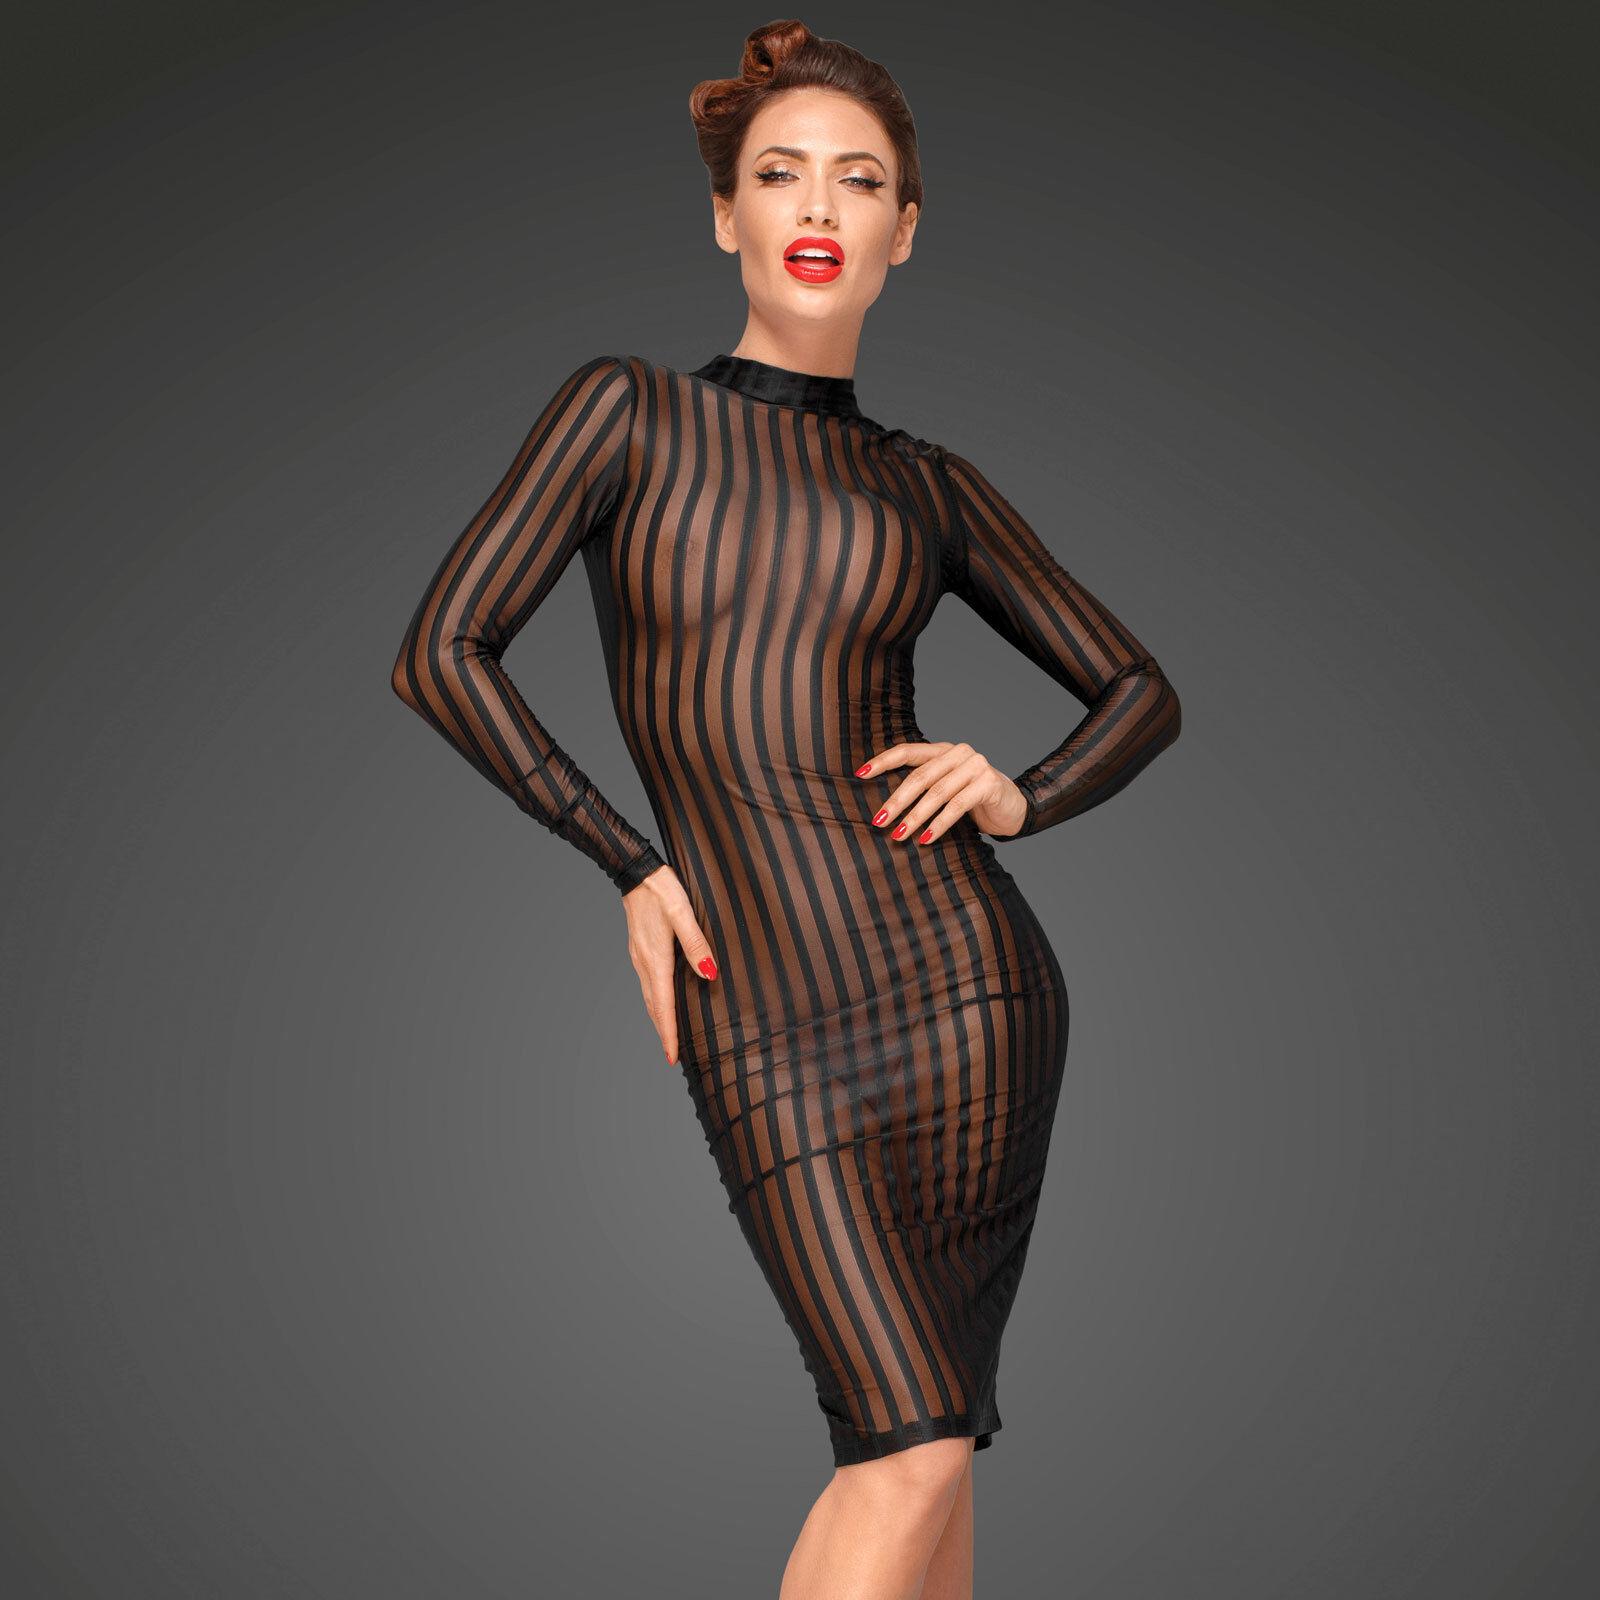 Noir Handmade Transparent Dress Stripe Mesh Dress Transparent Mesh Dress